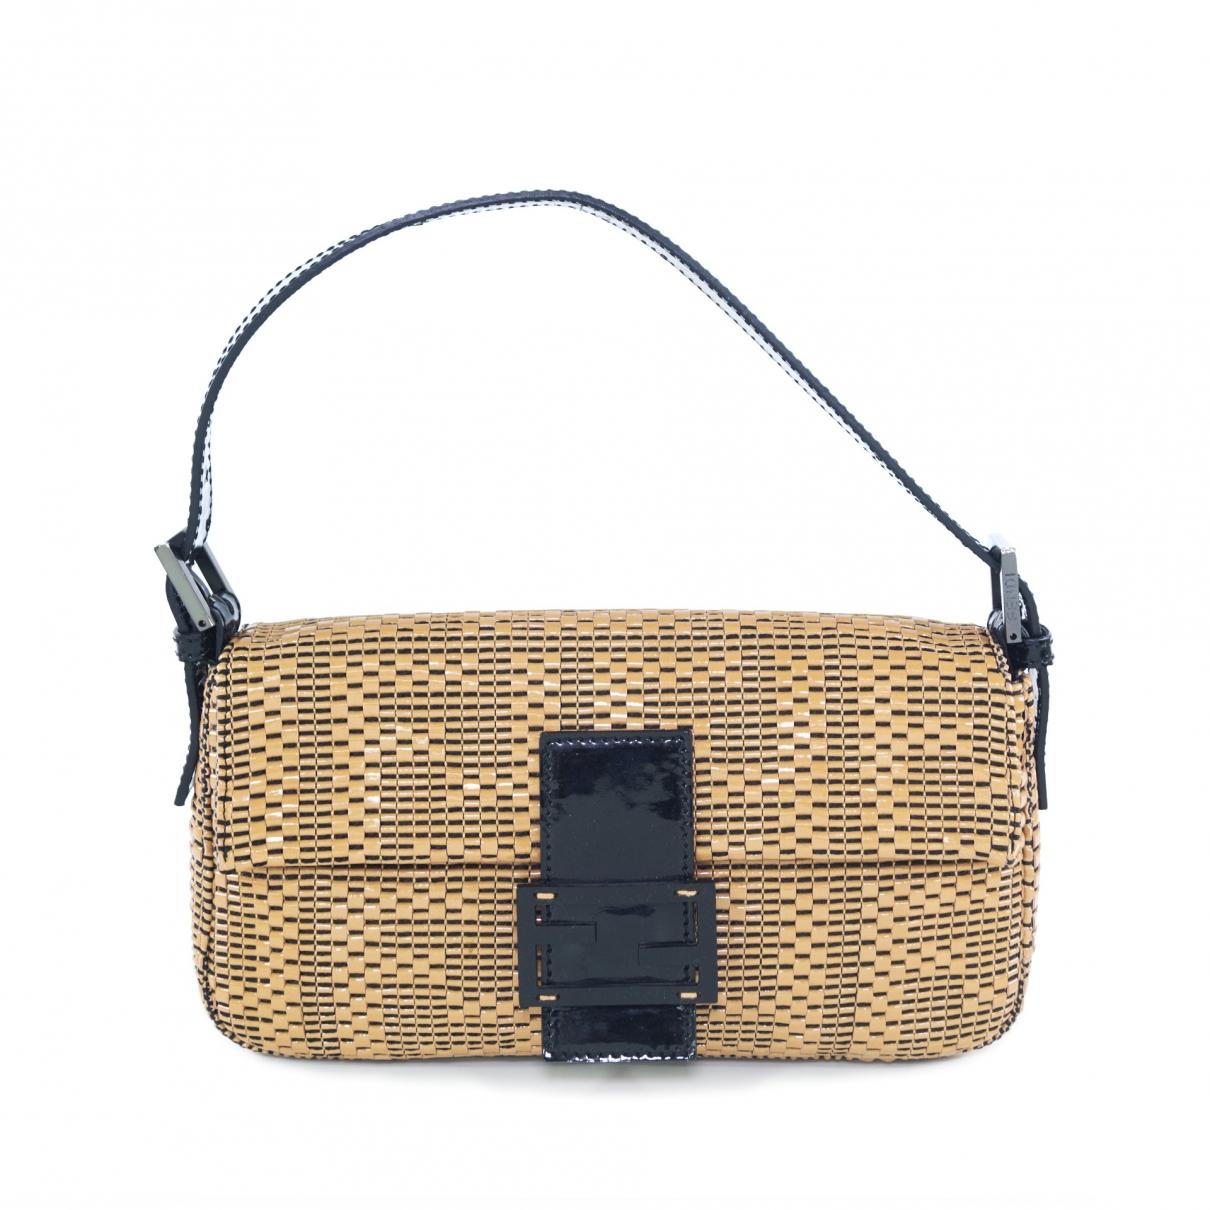 Fendi Baguette Beige Patent leather handbag for Women \N